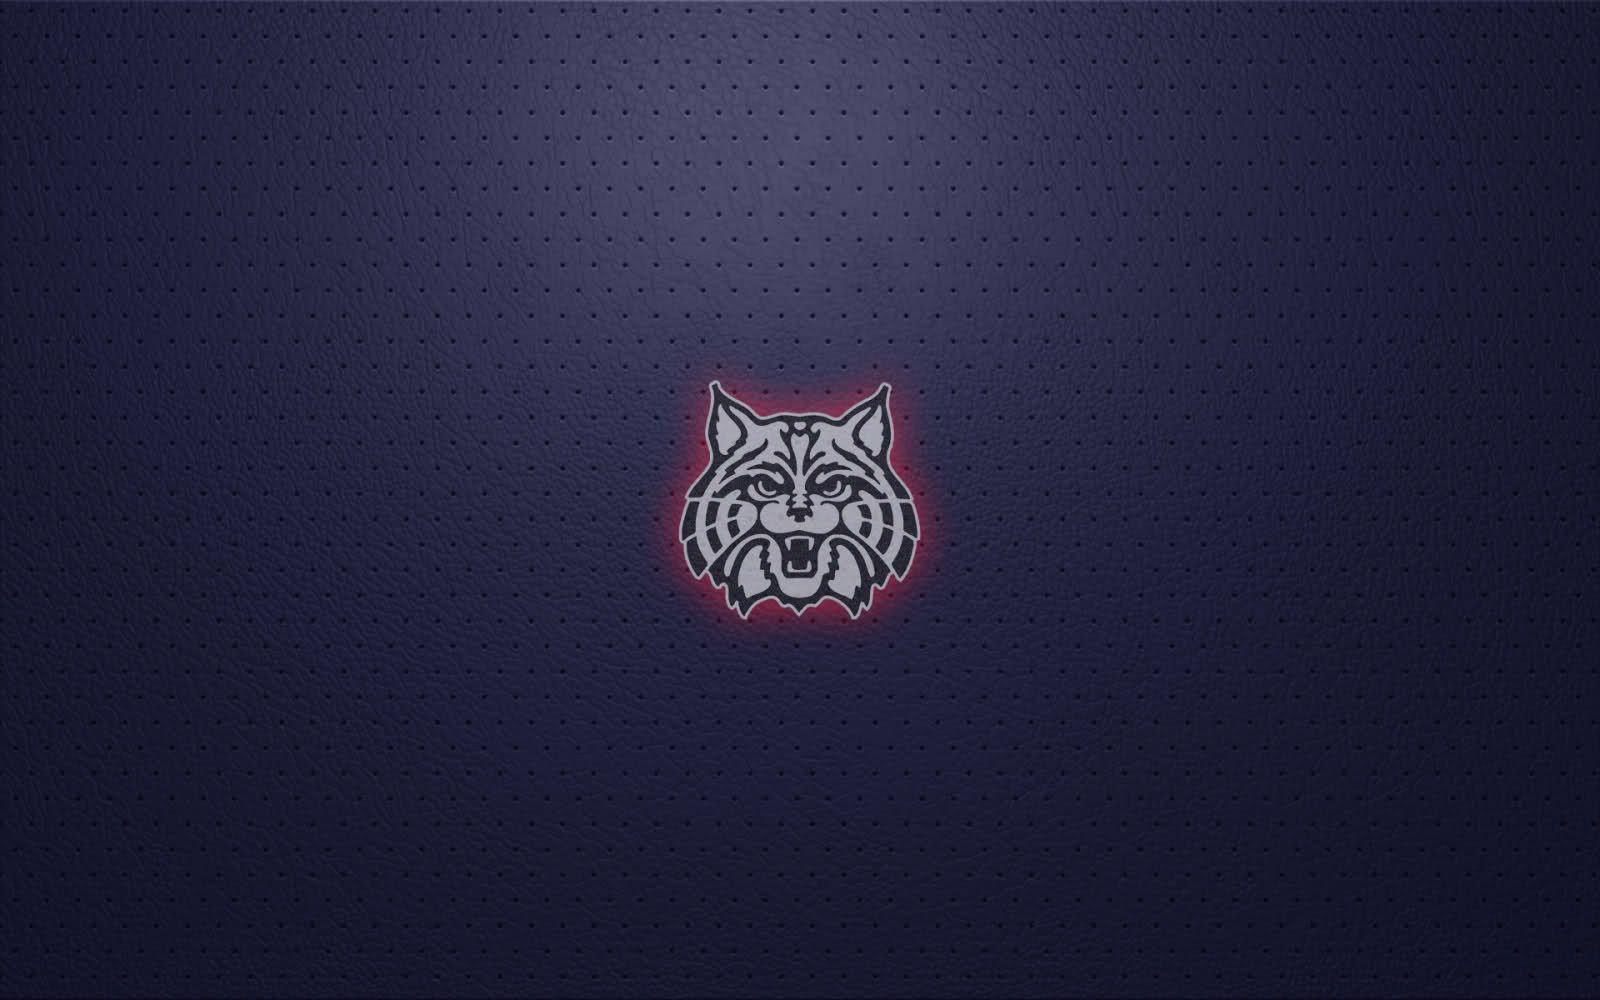 Arizona Wildcats Iphone Wallpaper University of \x3cb\x3earizona 1600x1000